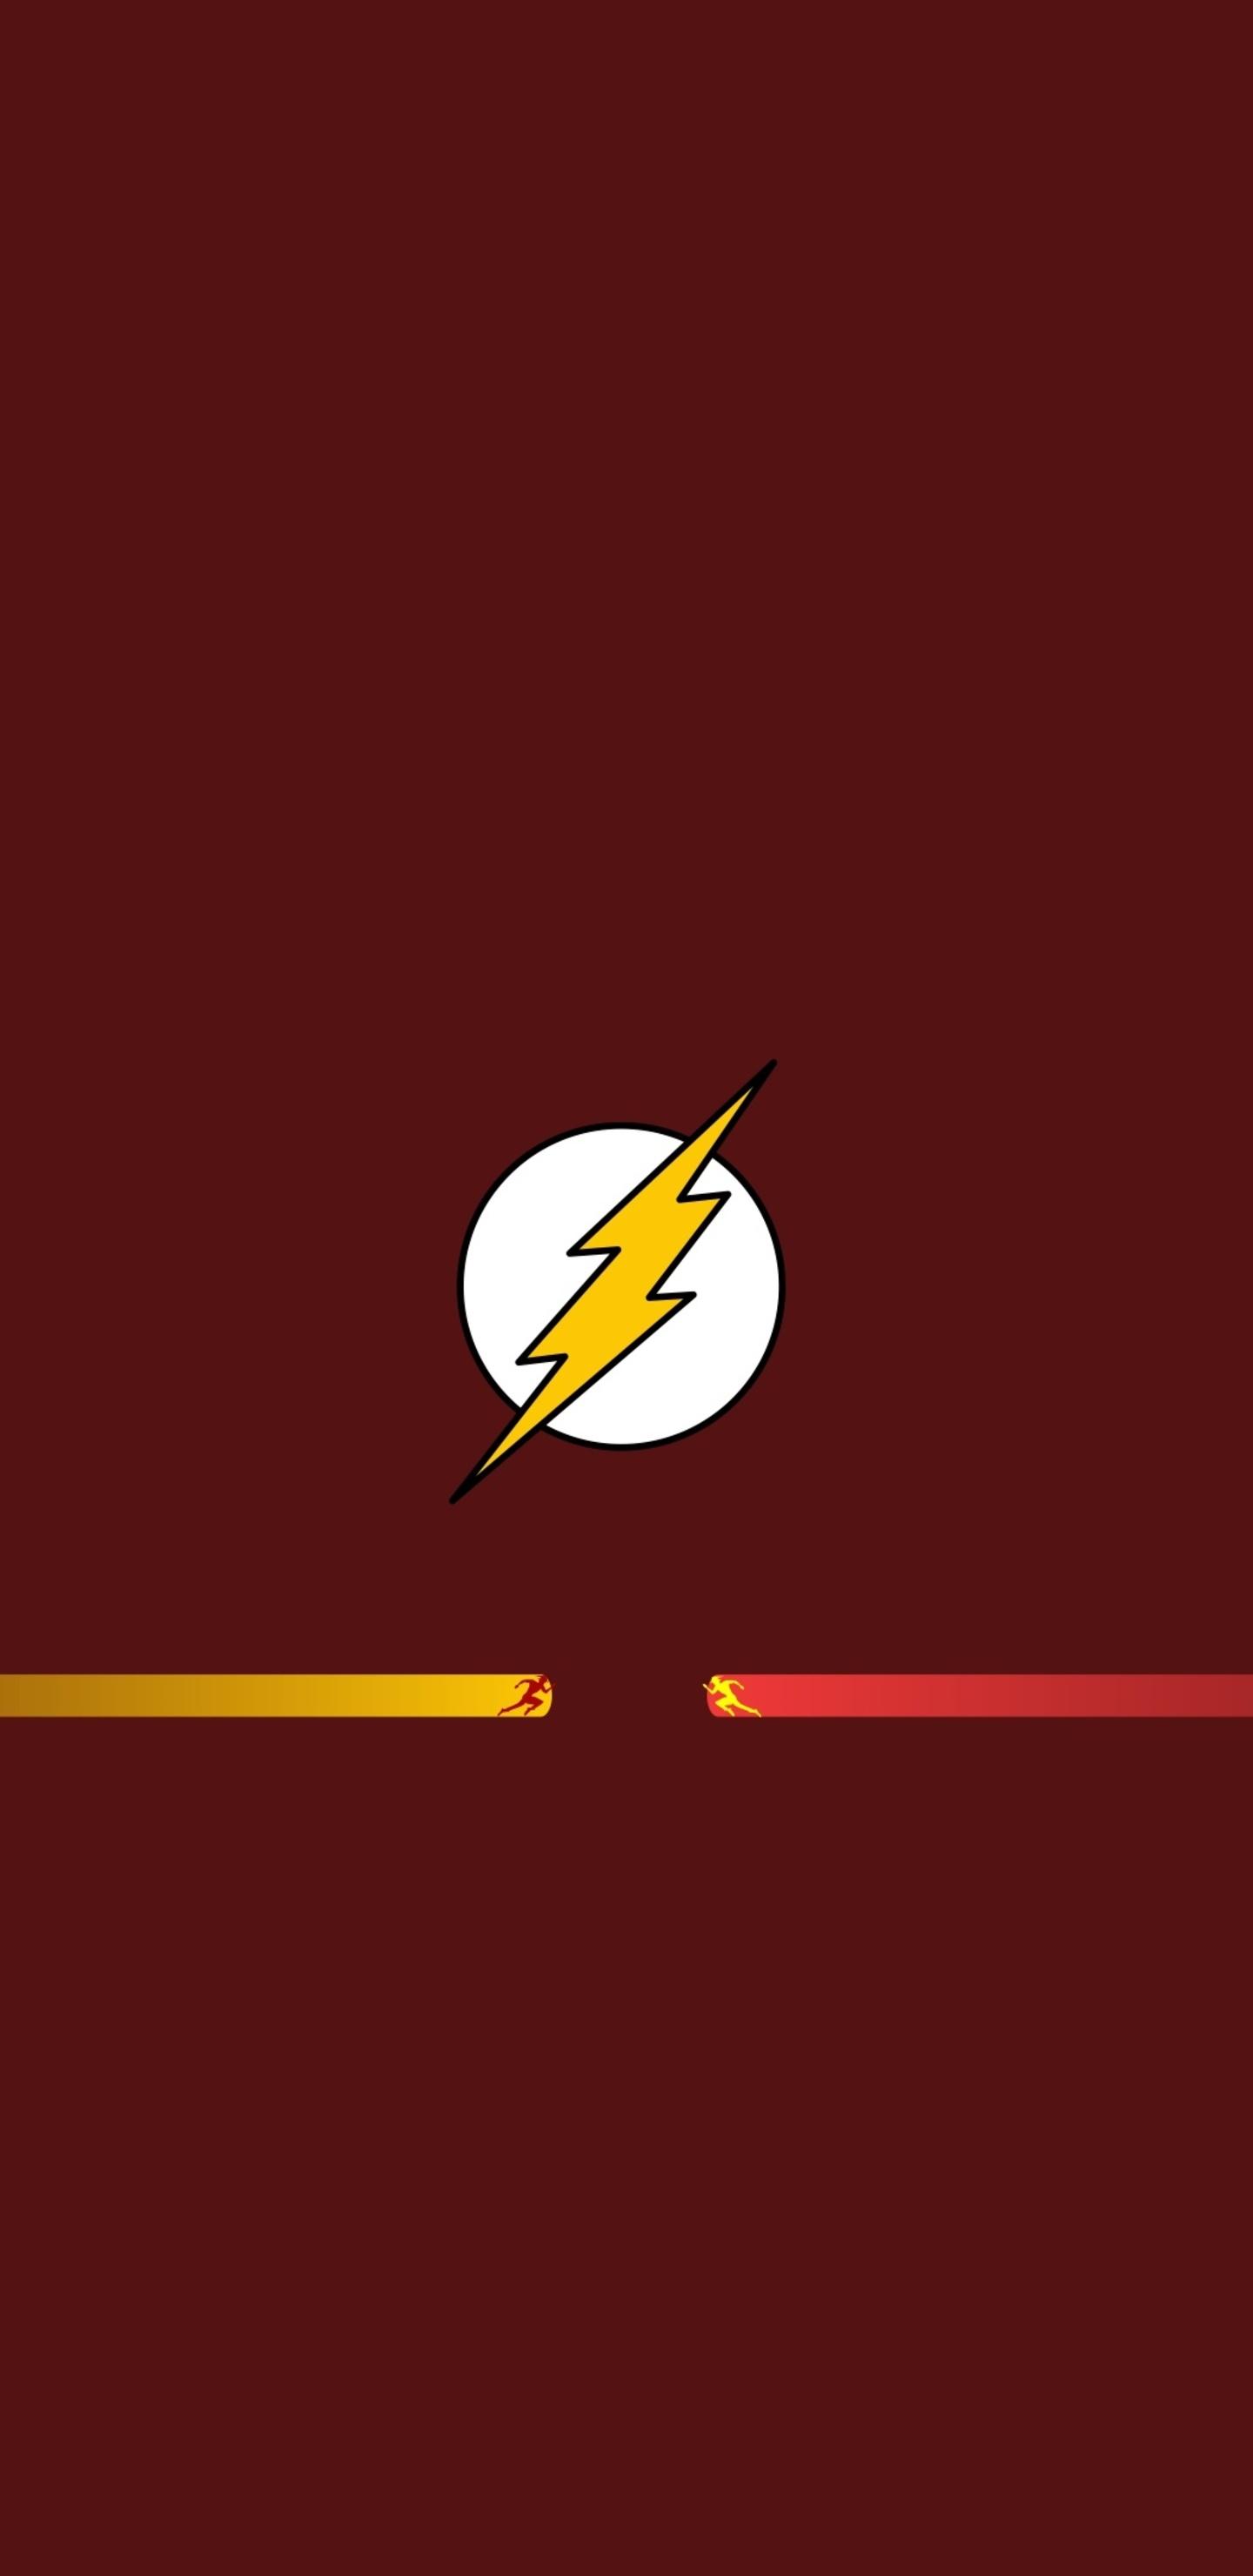 the-flash-and-reverse-flash-minimalism-71.jpg